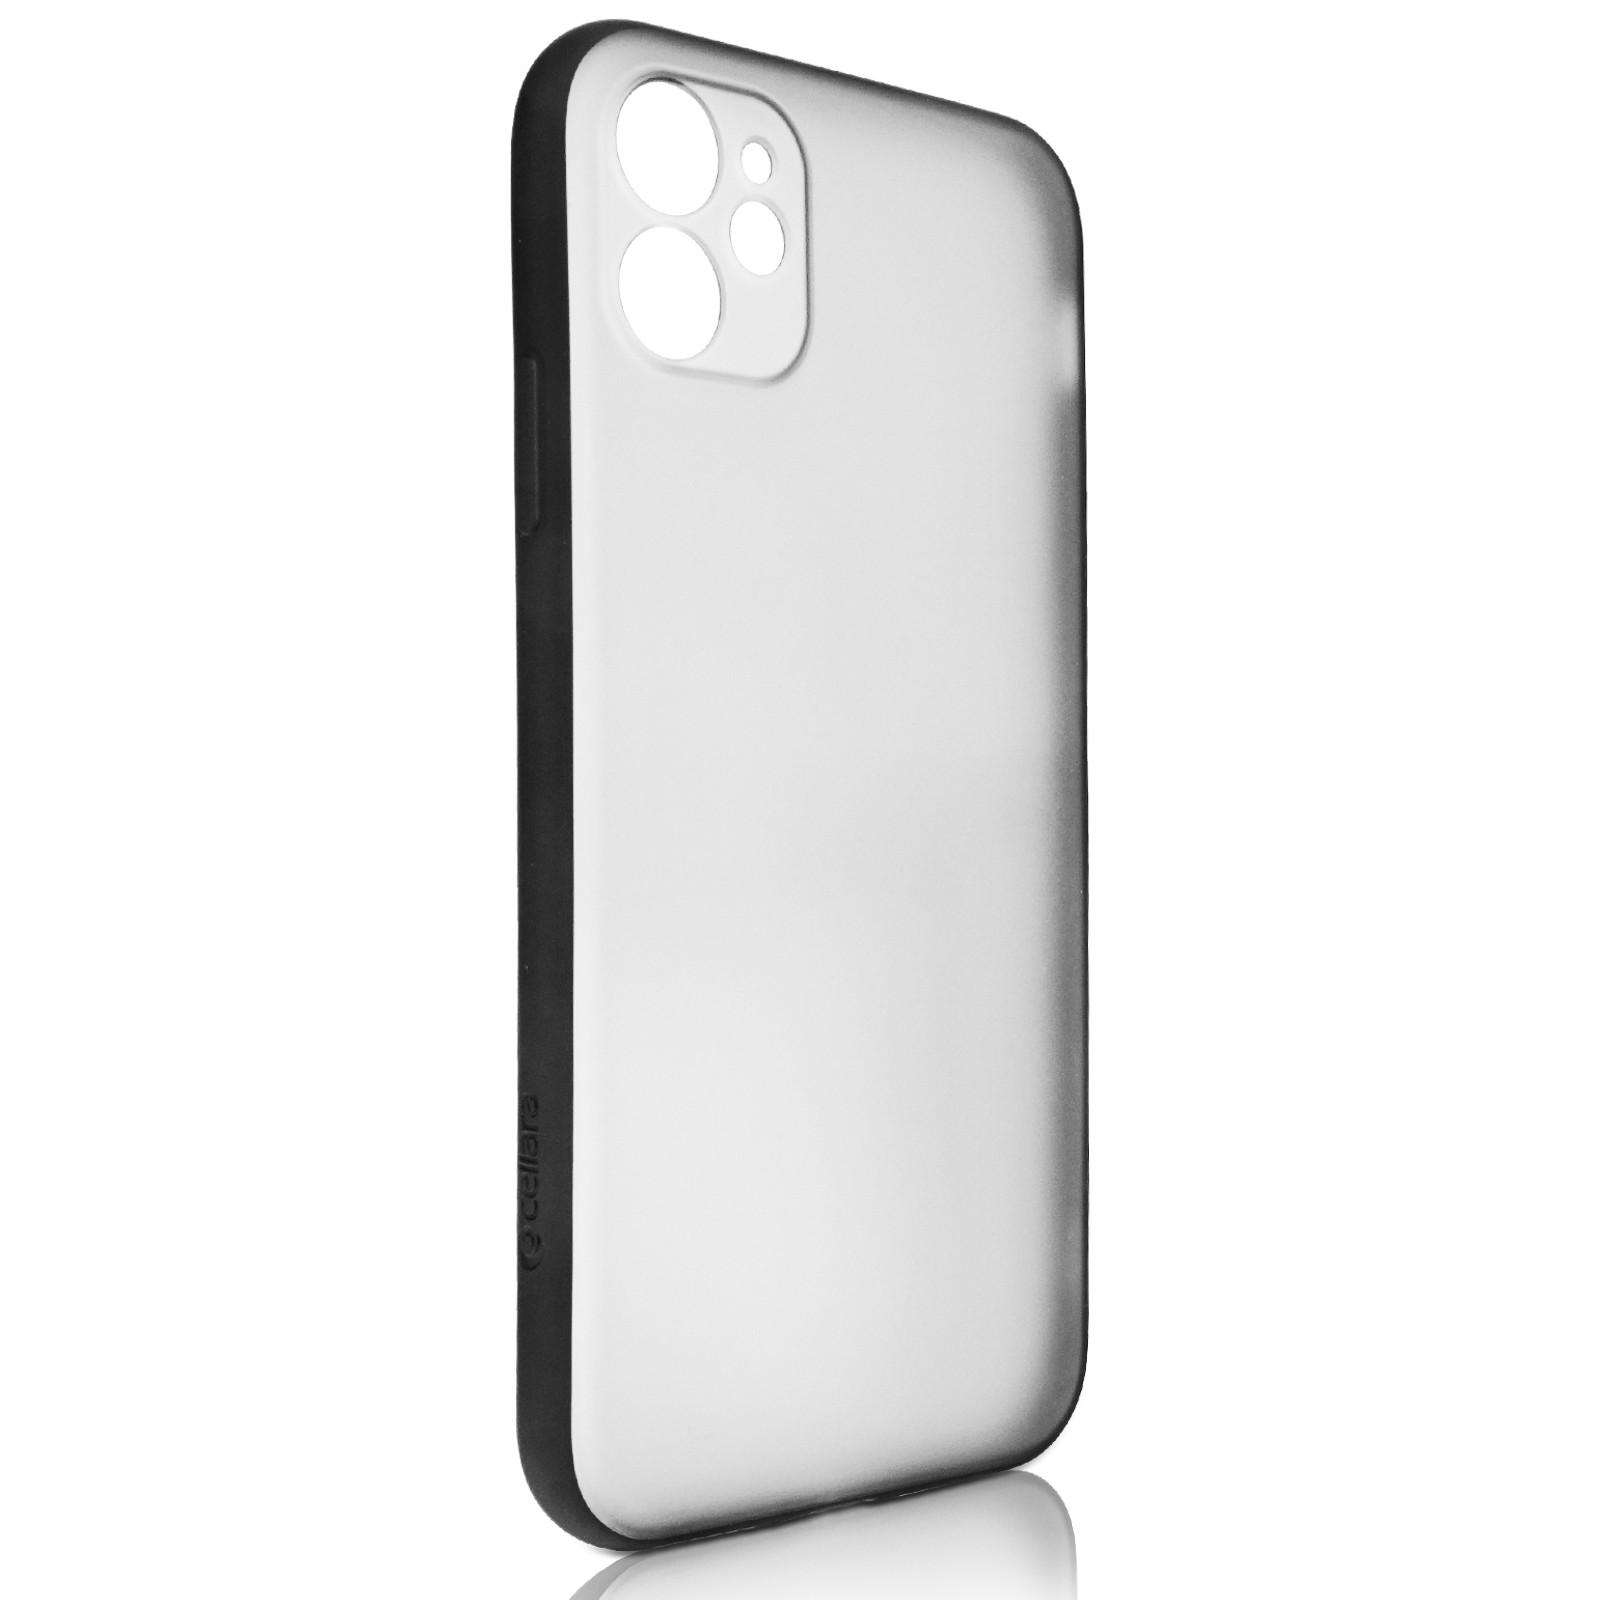 Capac protectie spate cellara colectia shade pentru iphone 11 - negru